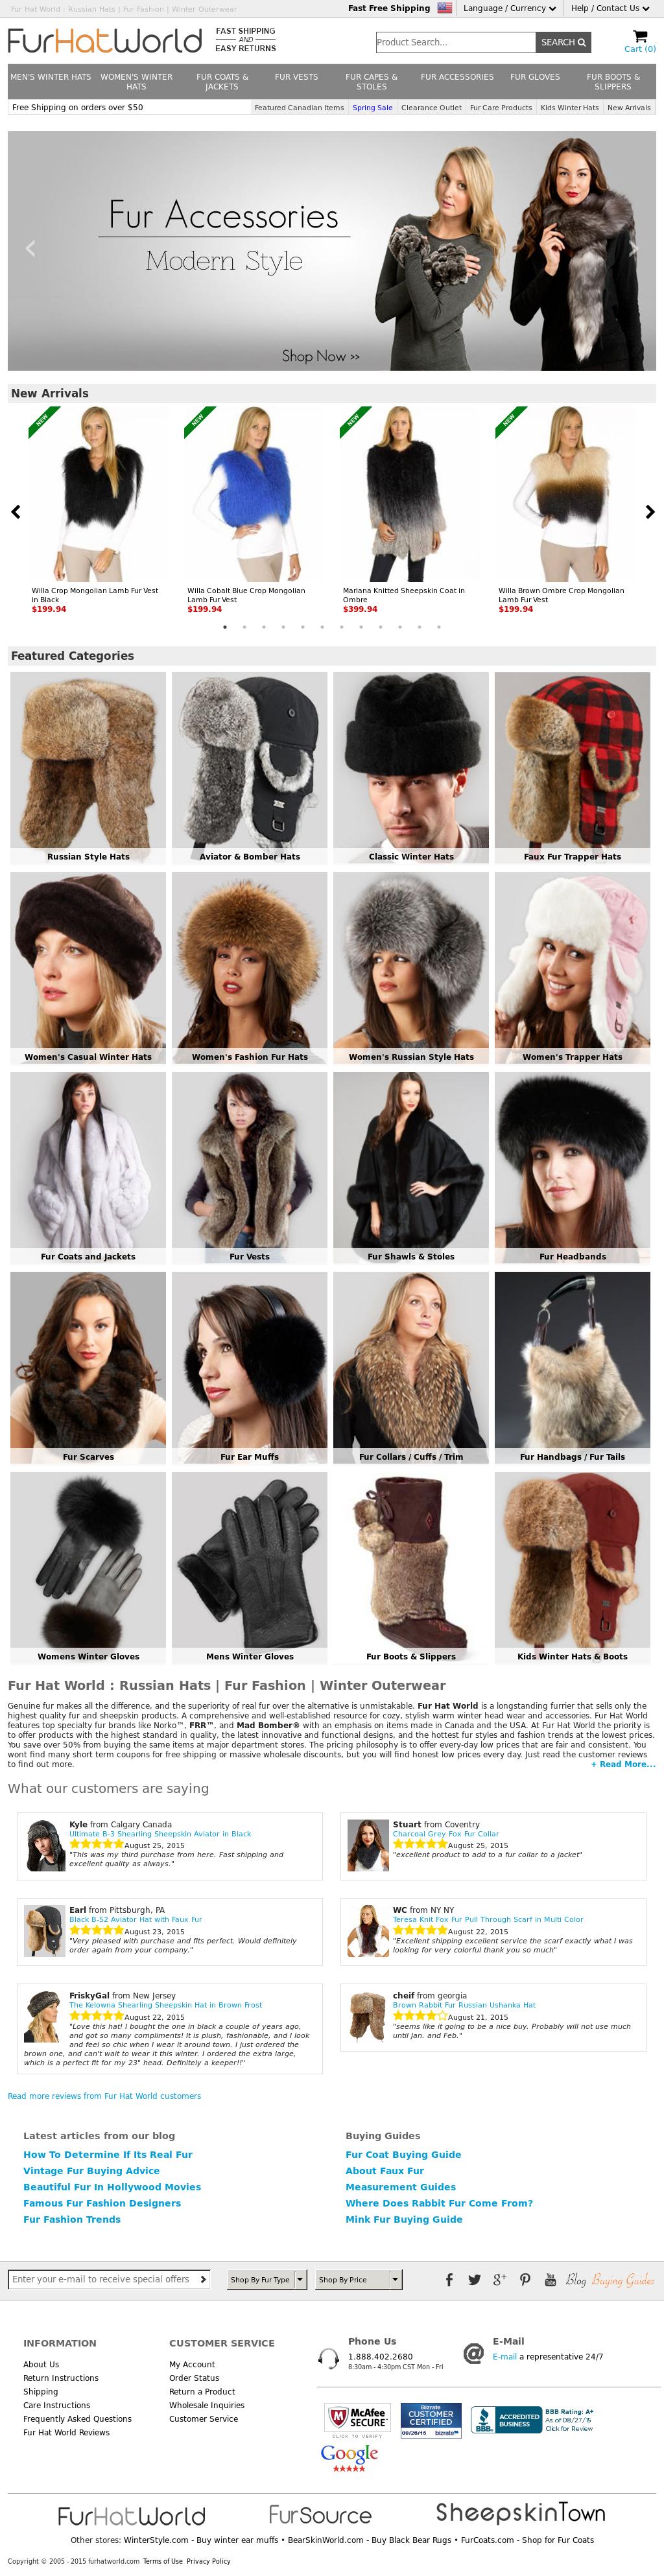 Fur Hat World Competitors 5af067b4b874